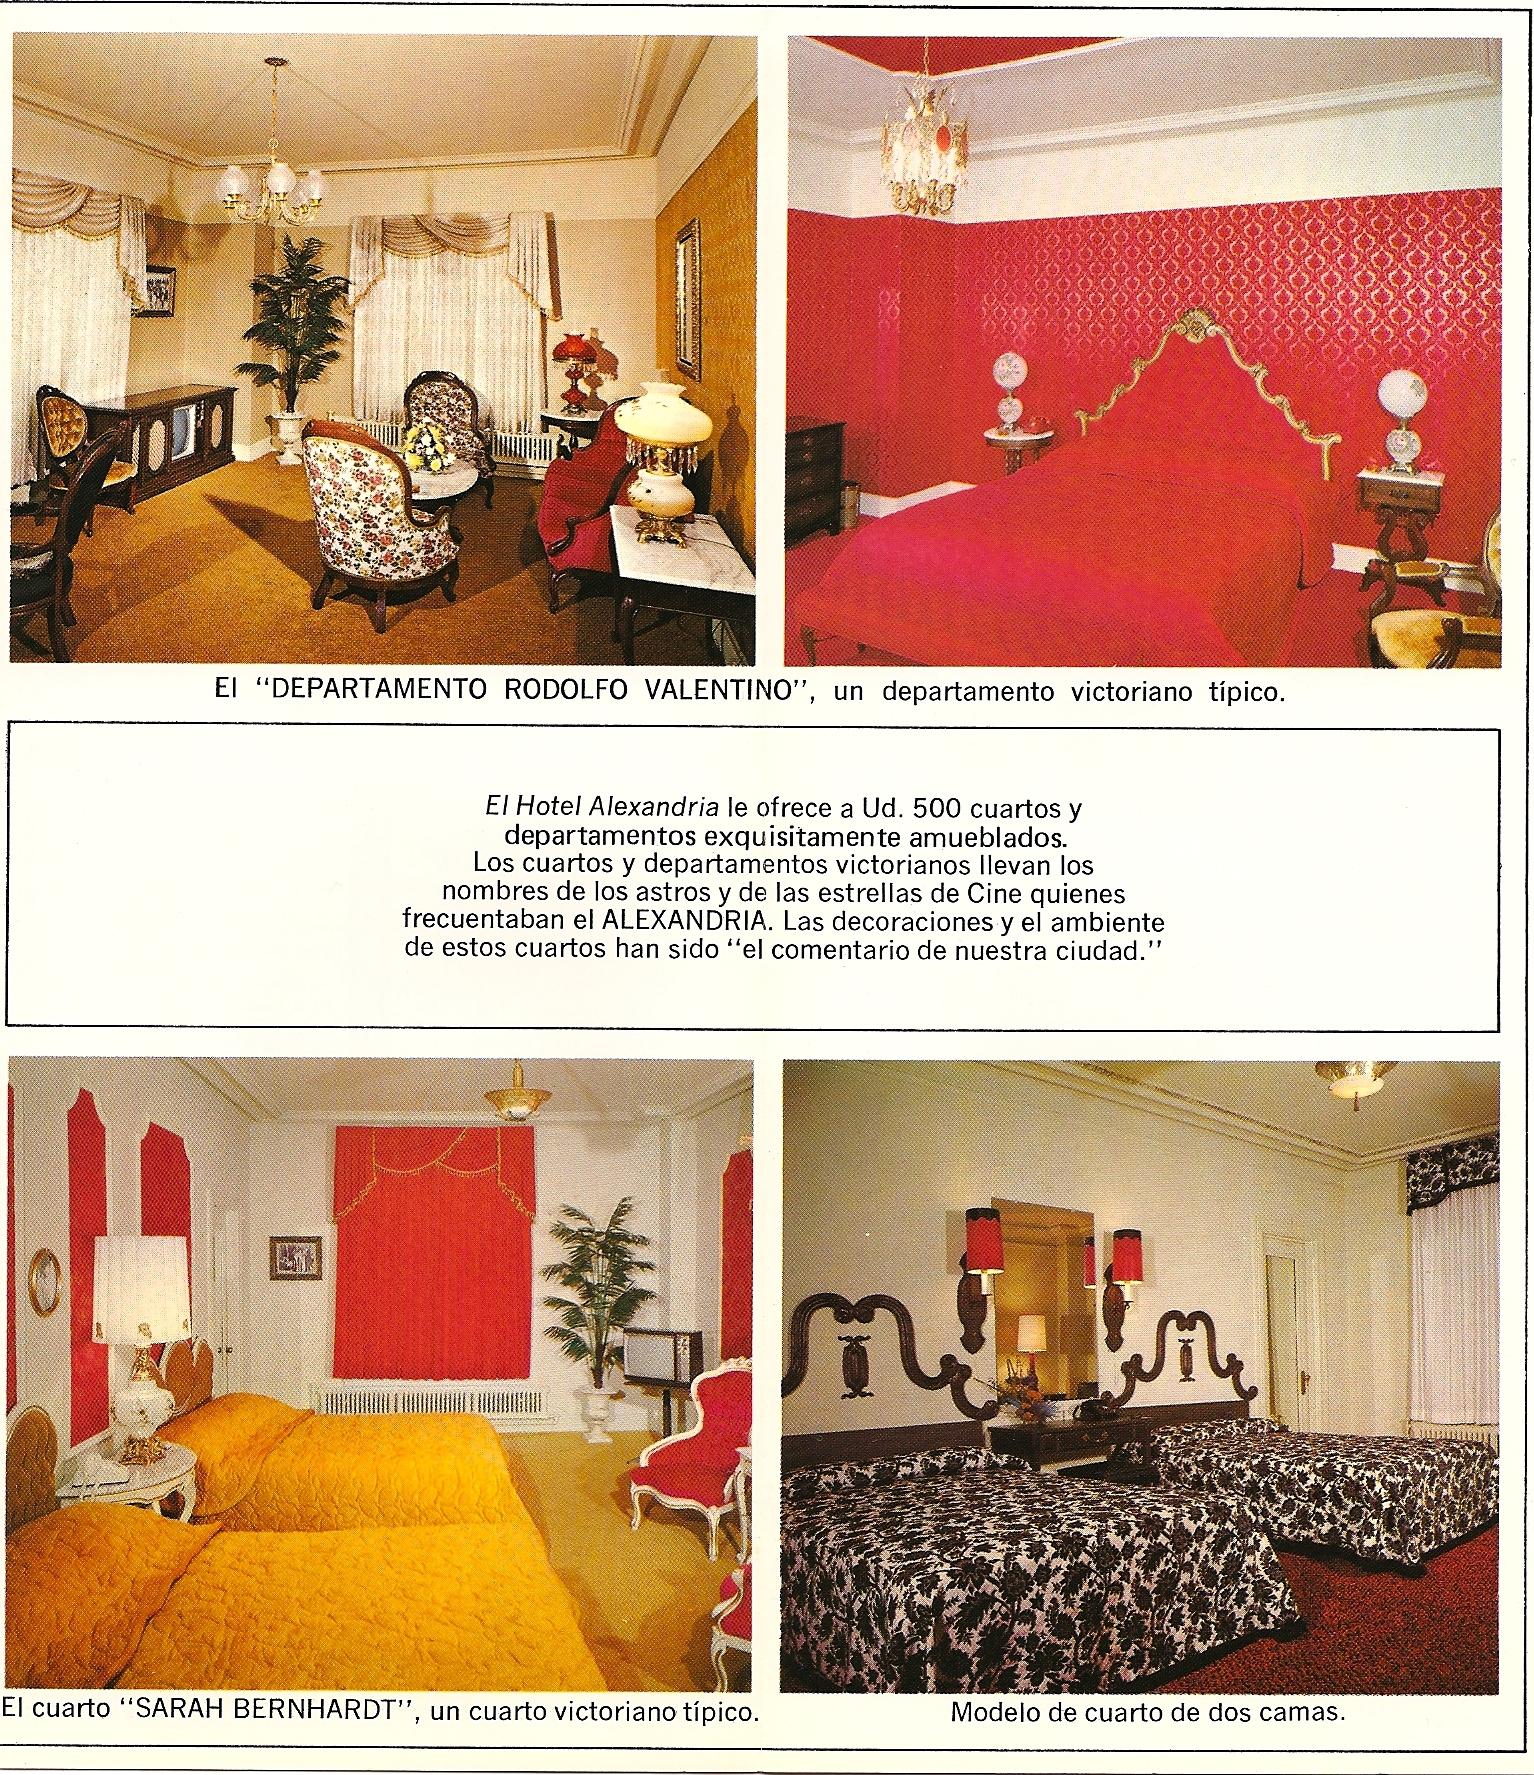 hotel brochure design inspiration - hotel brochure design sample 101greatbrochures of